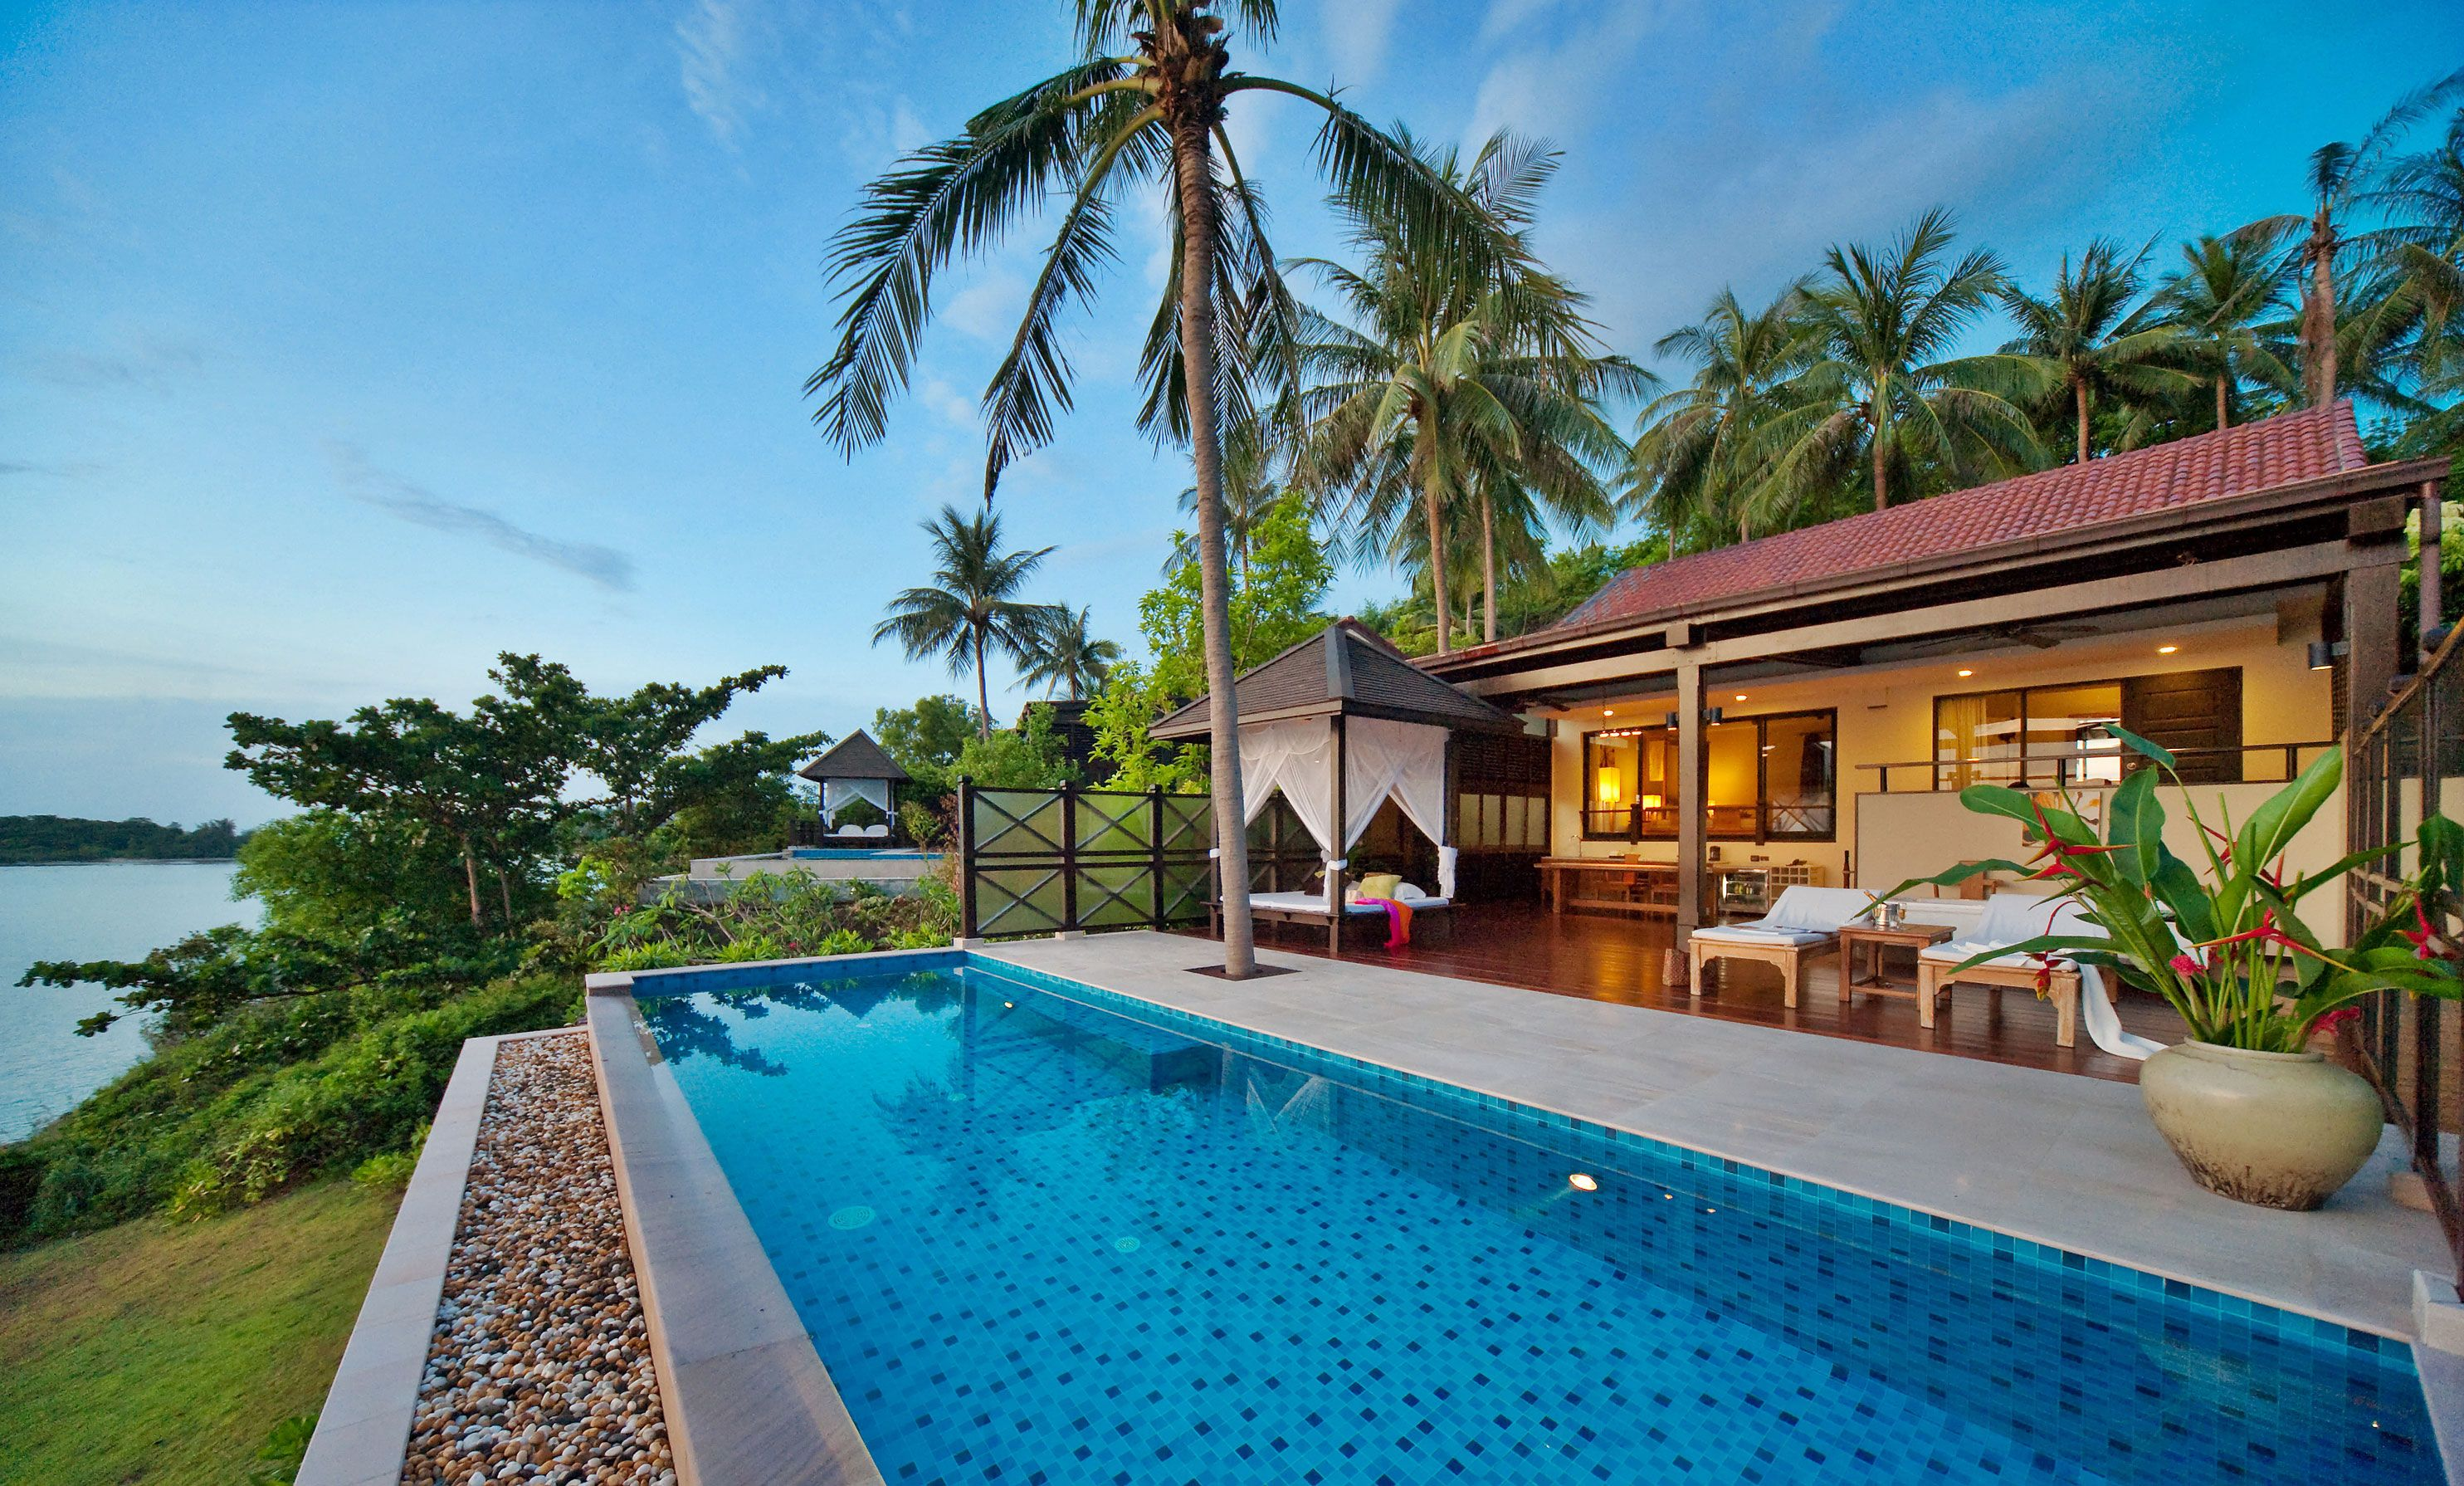 Boutique Hotel Koh Samui Thailand The Tongsai Bay Resort Koh Samui